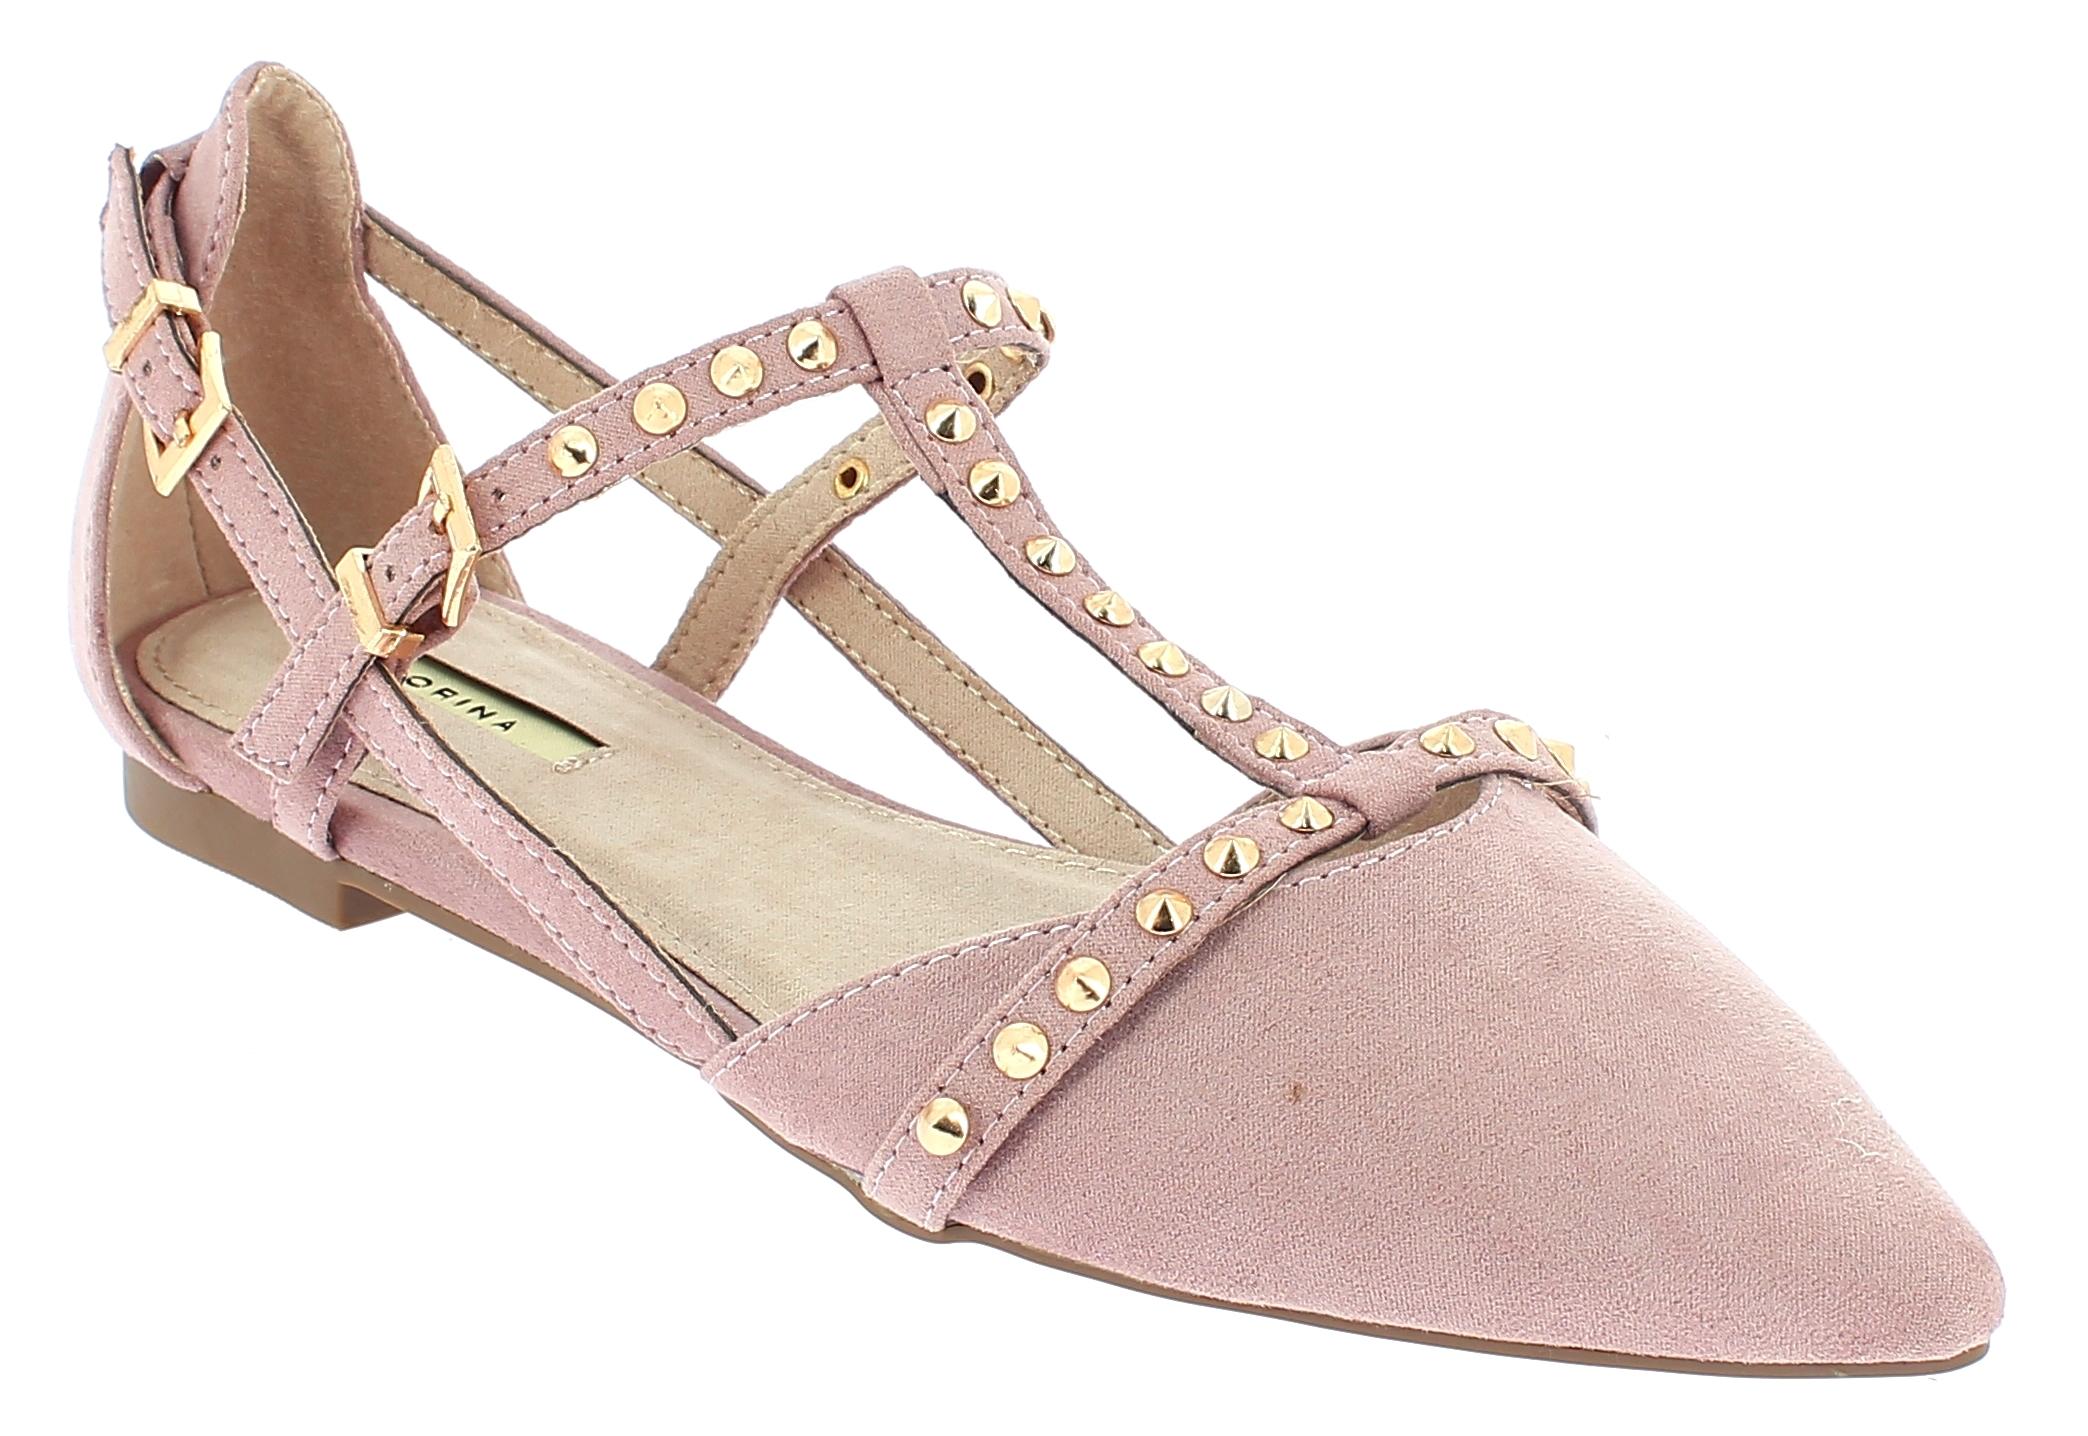 CORINA Γυναικεία Μπαλαρίνα C8236 Ροζ - IqShoes - C8236 ROSA-CORINA-pink-37/1/11/ παπούτσια  new in